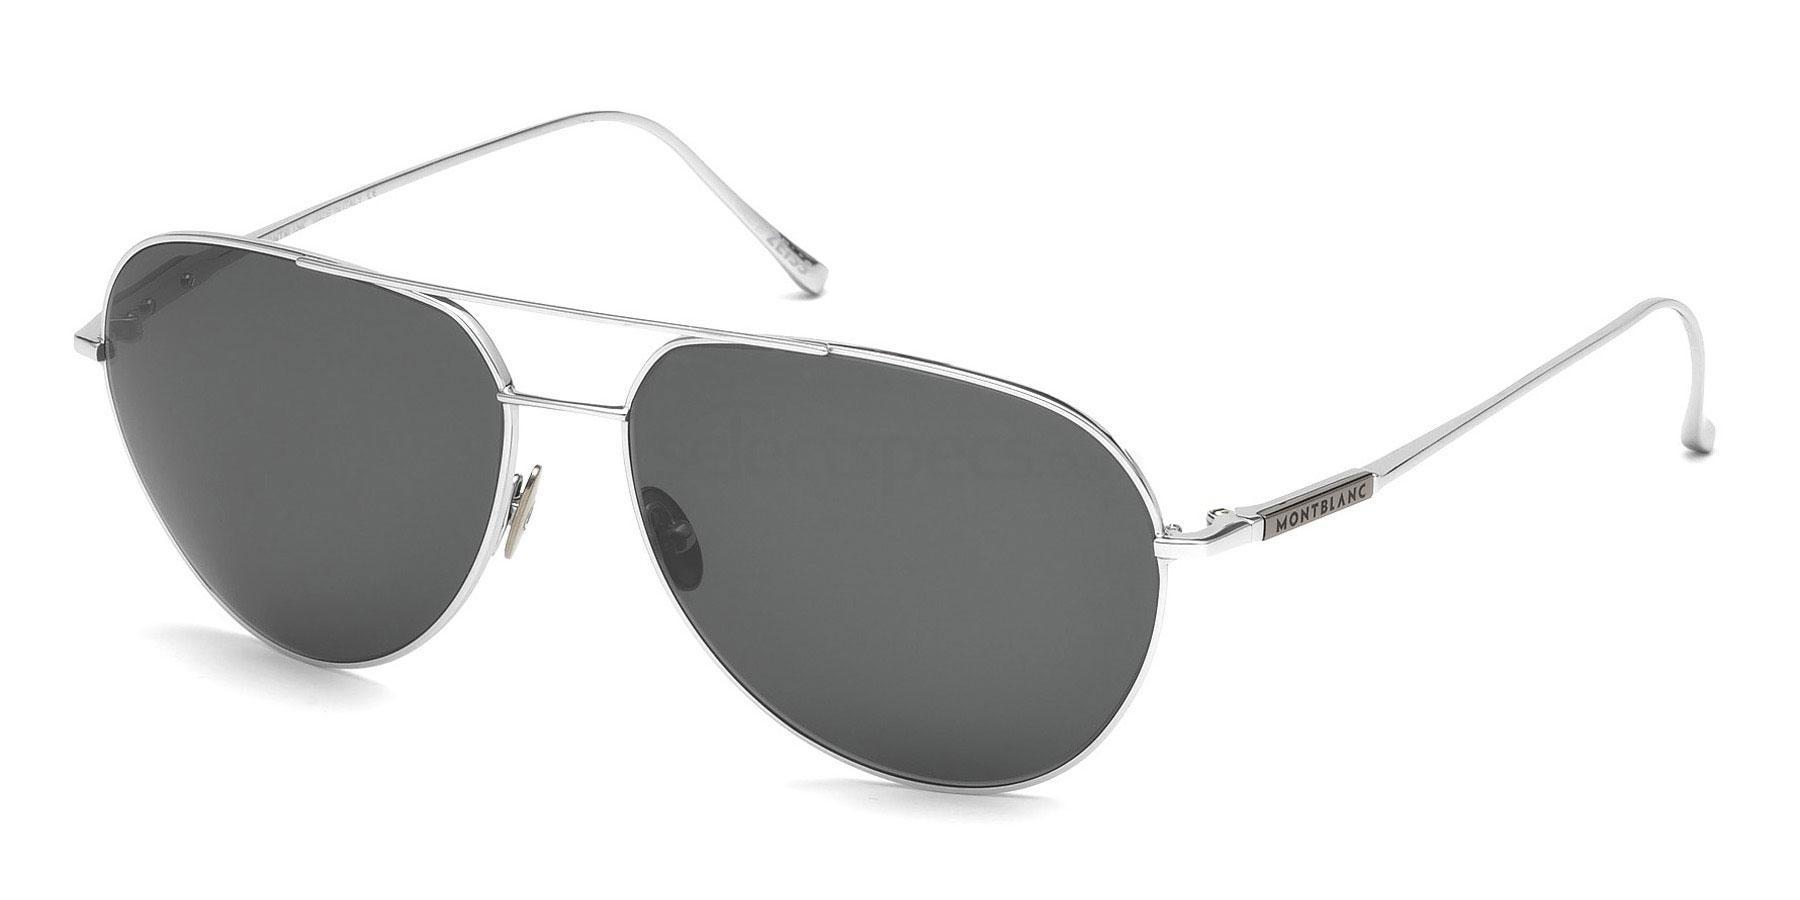 16A MB657S Sunglasses, Mont Blanc